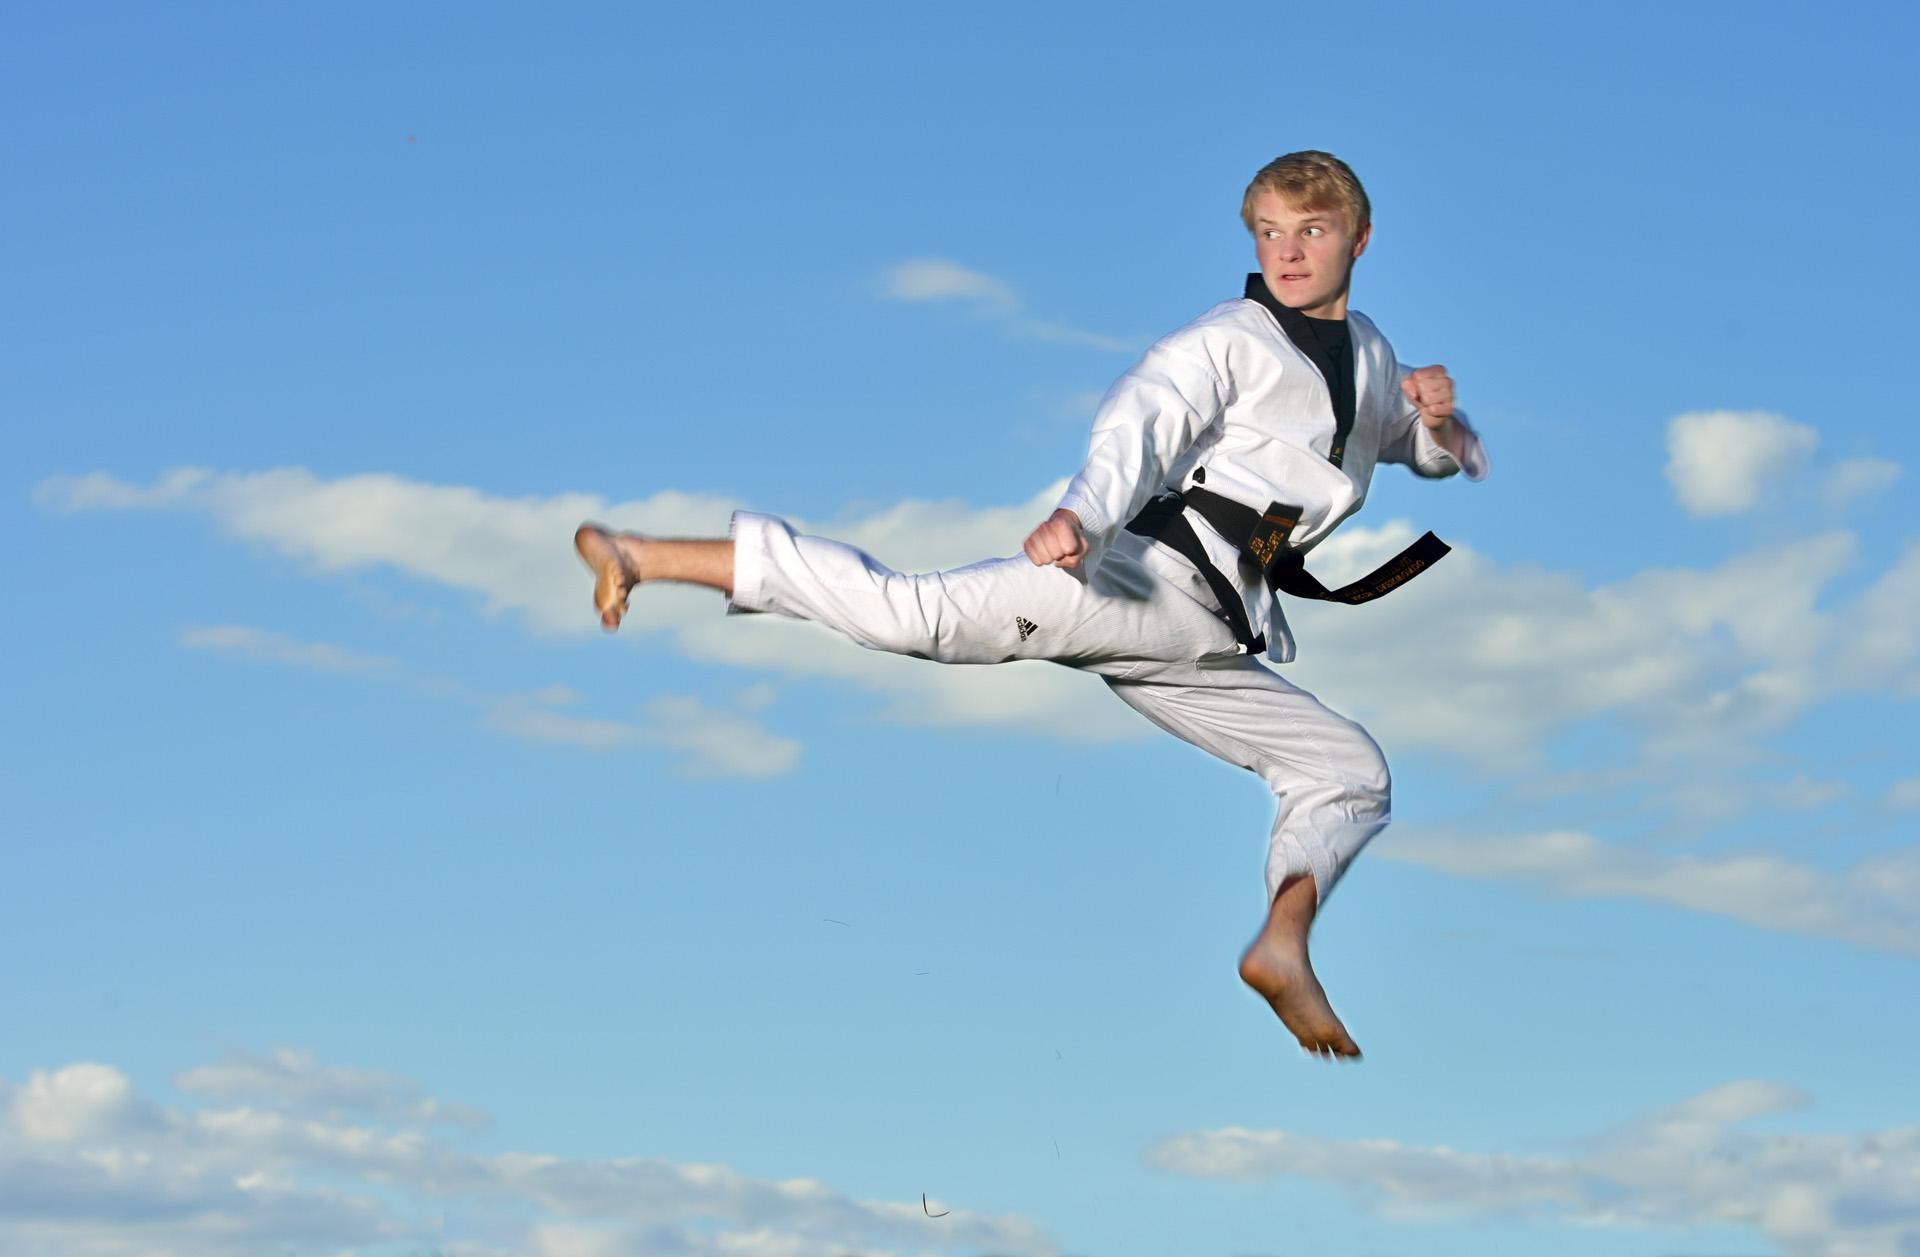 Troy High School student shows off his taekwondo skills on a hilltop in Birmingham, Michigan for a dynamic, powerful senior photo.